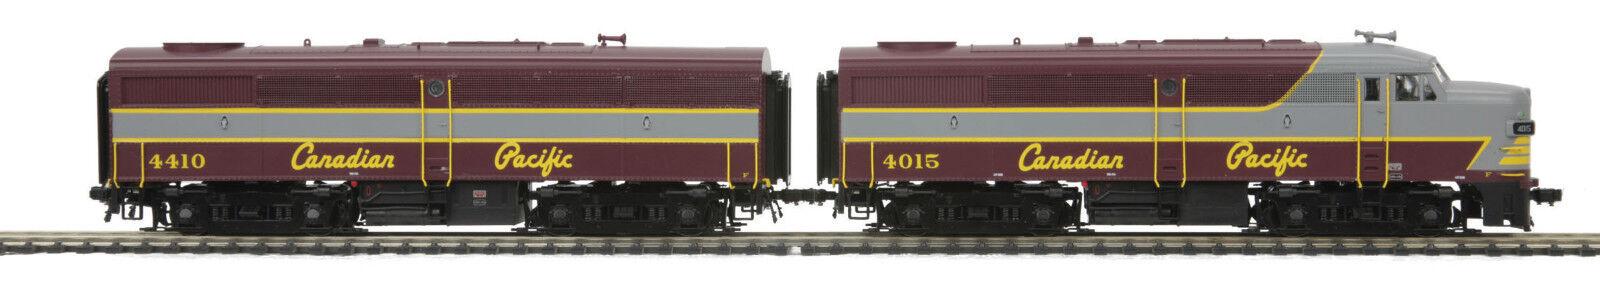 Mit 80-2206-0 ho fa-1 a   b set canadian pacific 4025 lokomotive hat dcc bereit